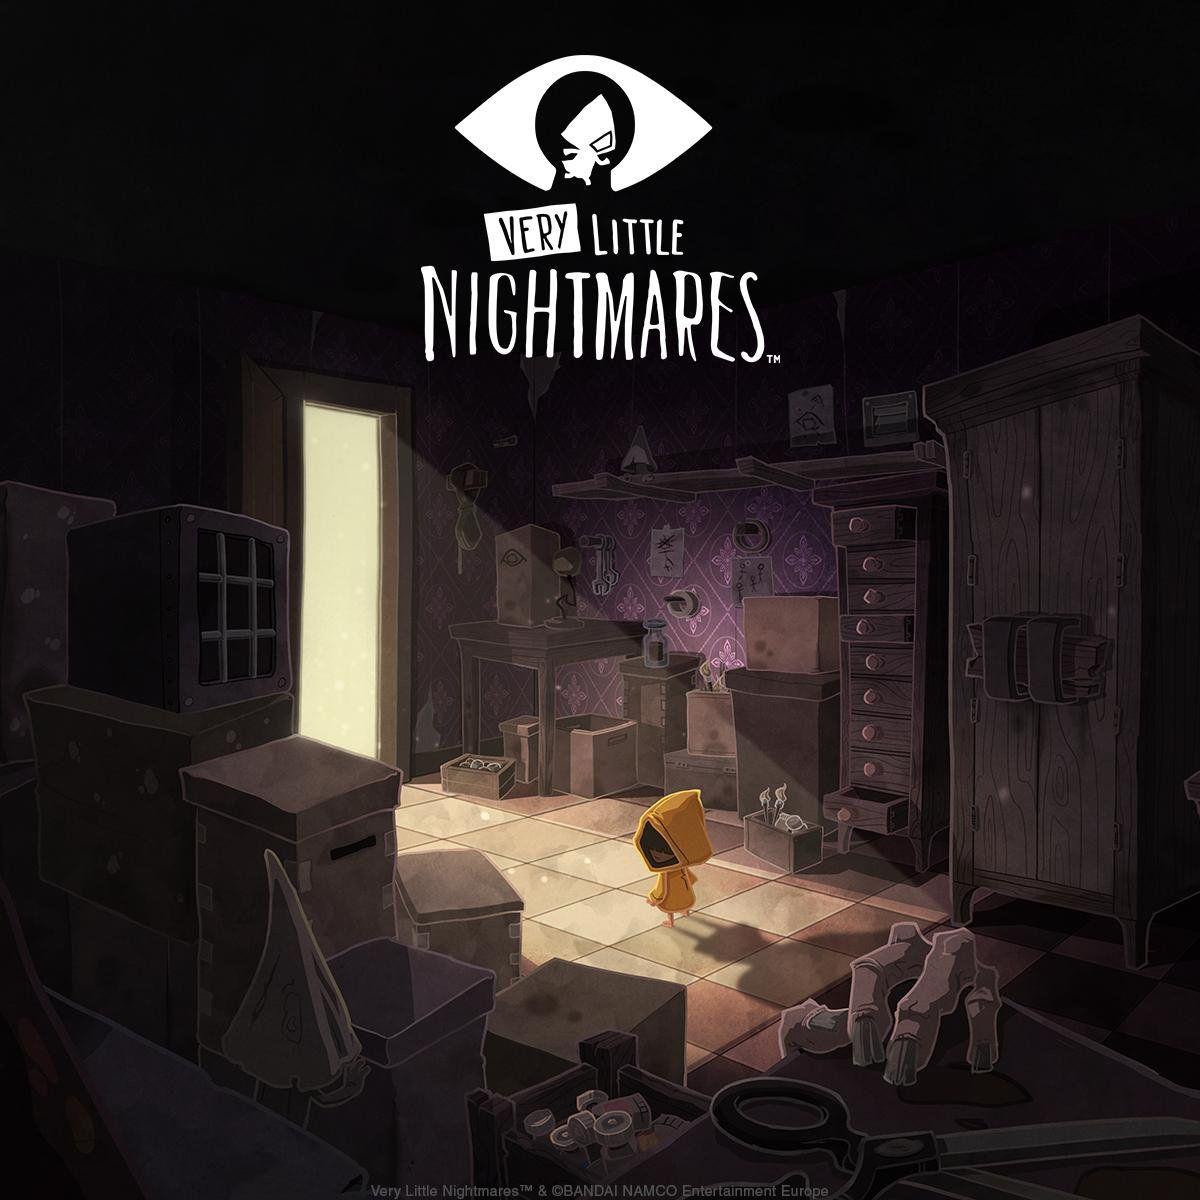 Very Little Nightmares PlayStore